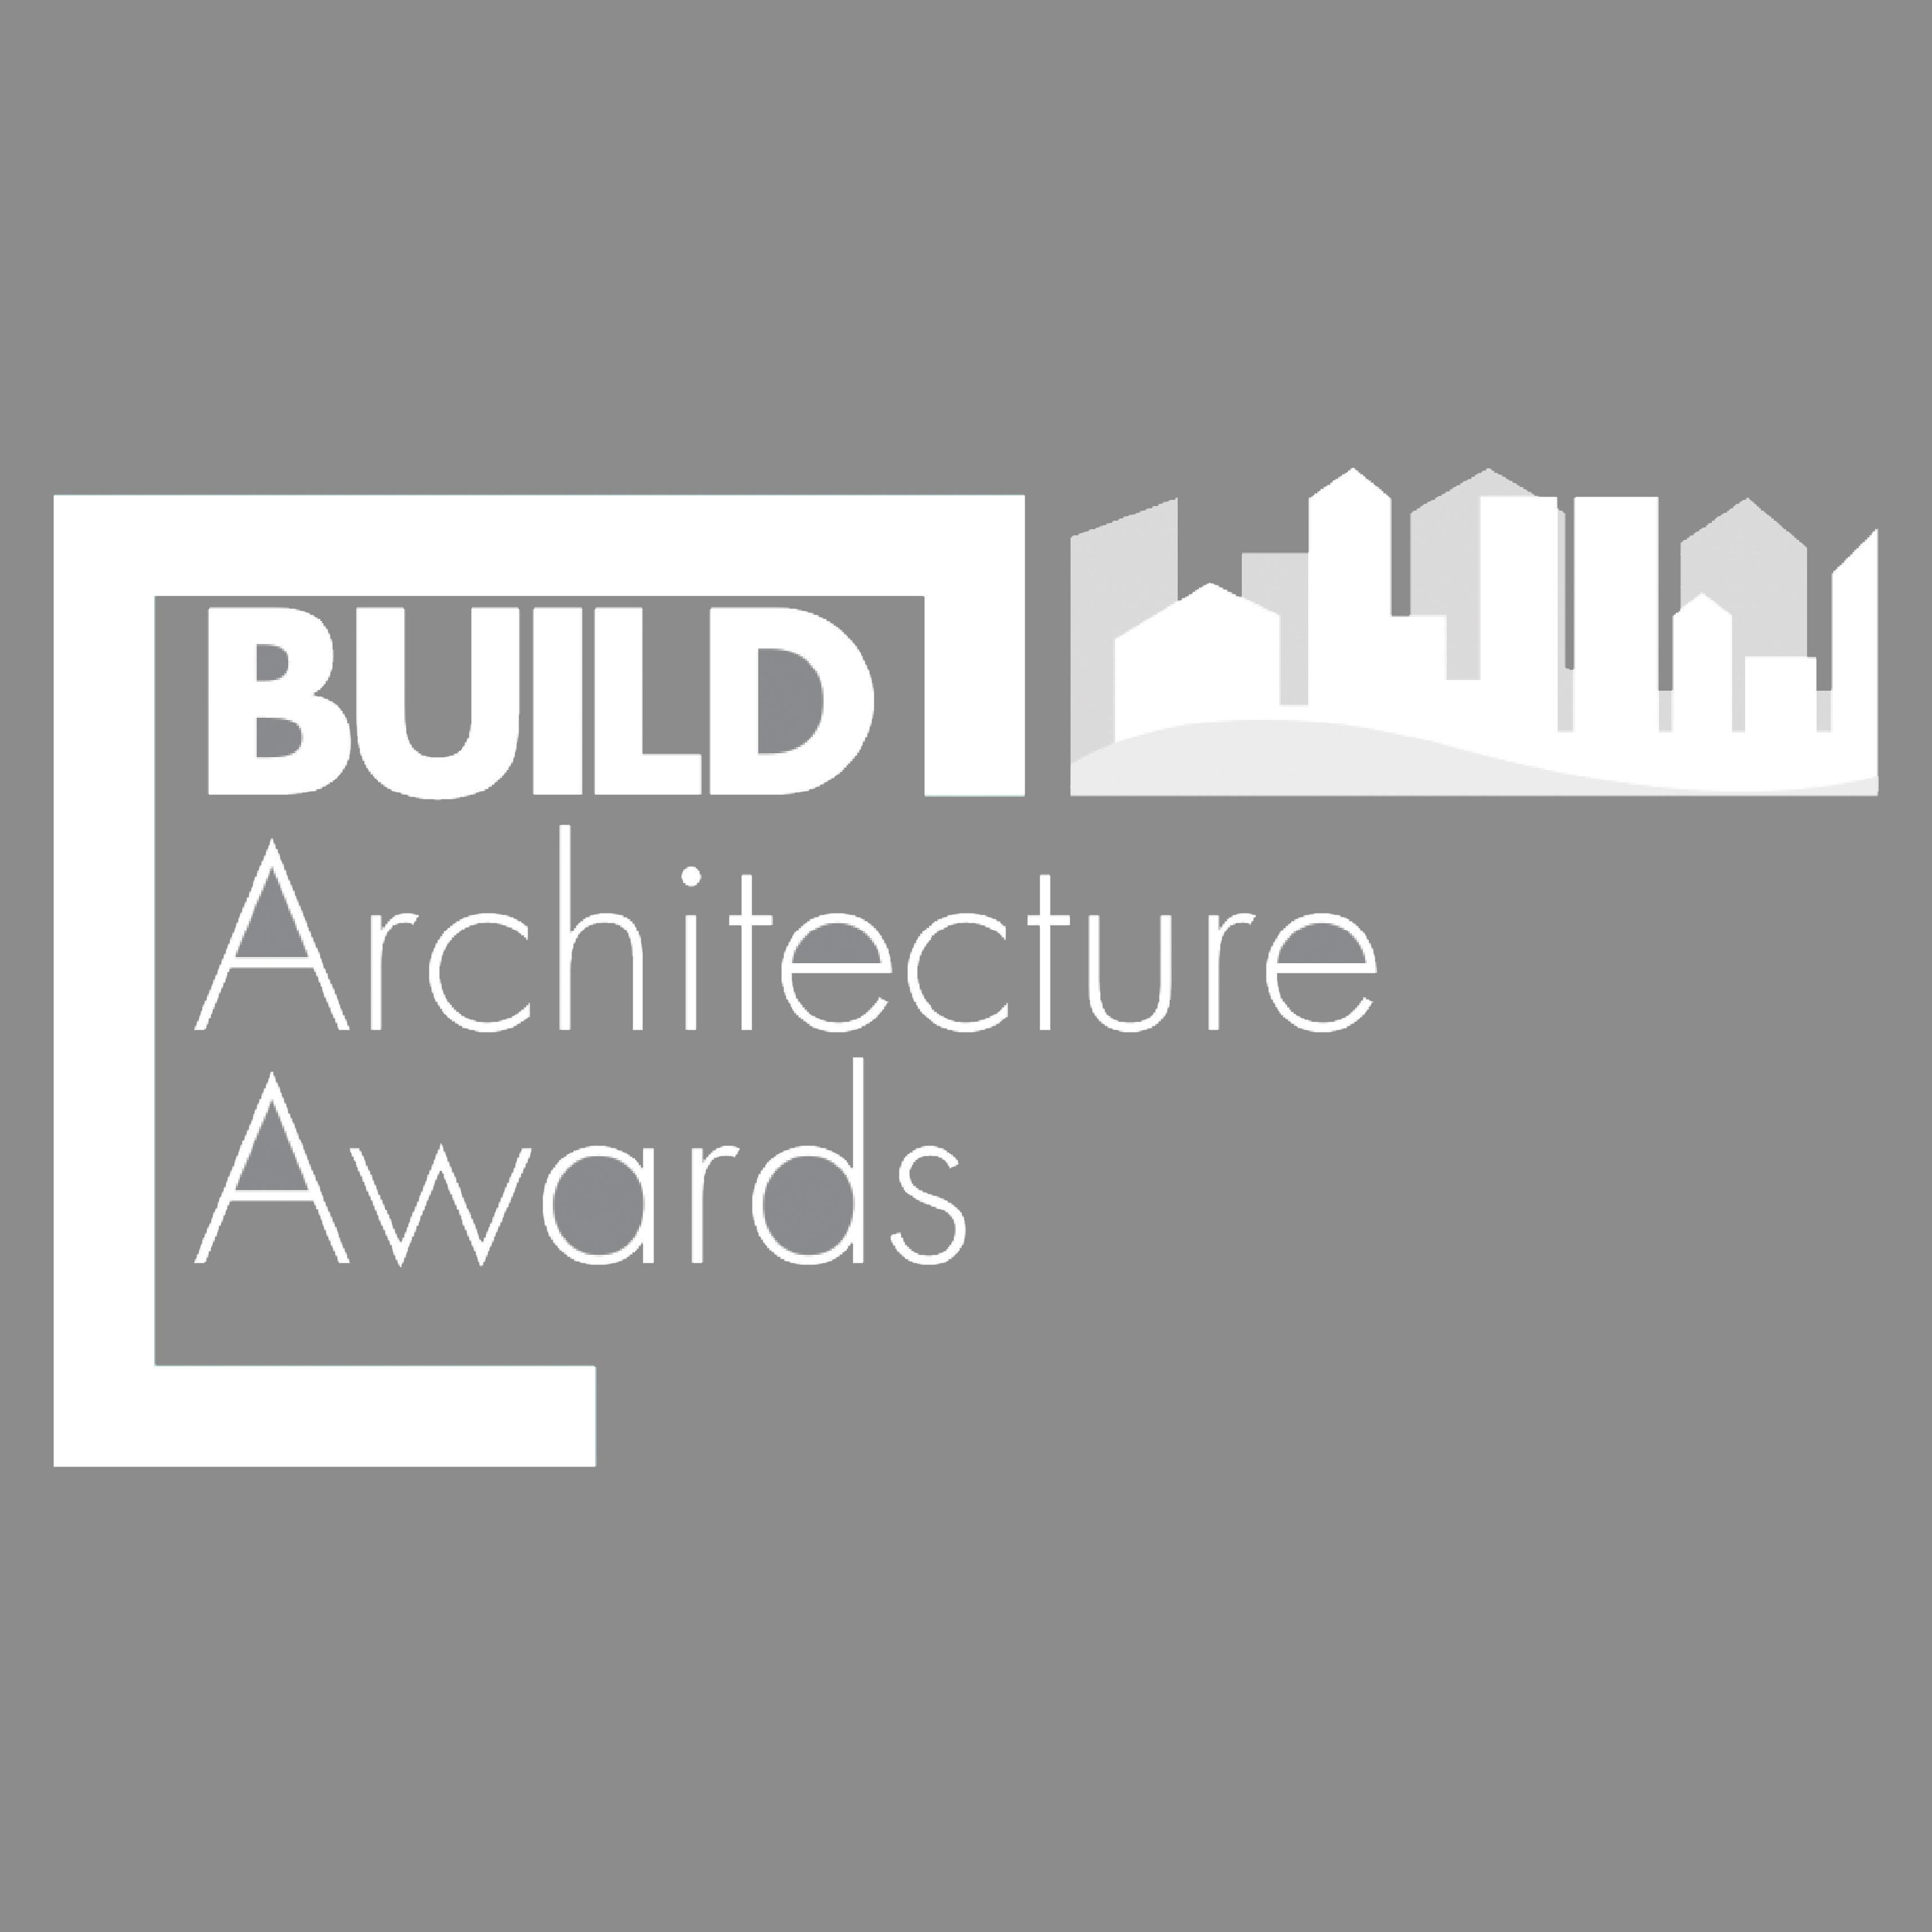 Best Architectural & Urban Design Practice - APAC